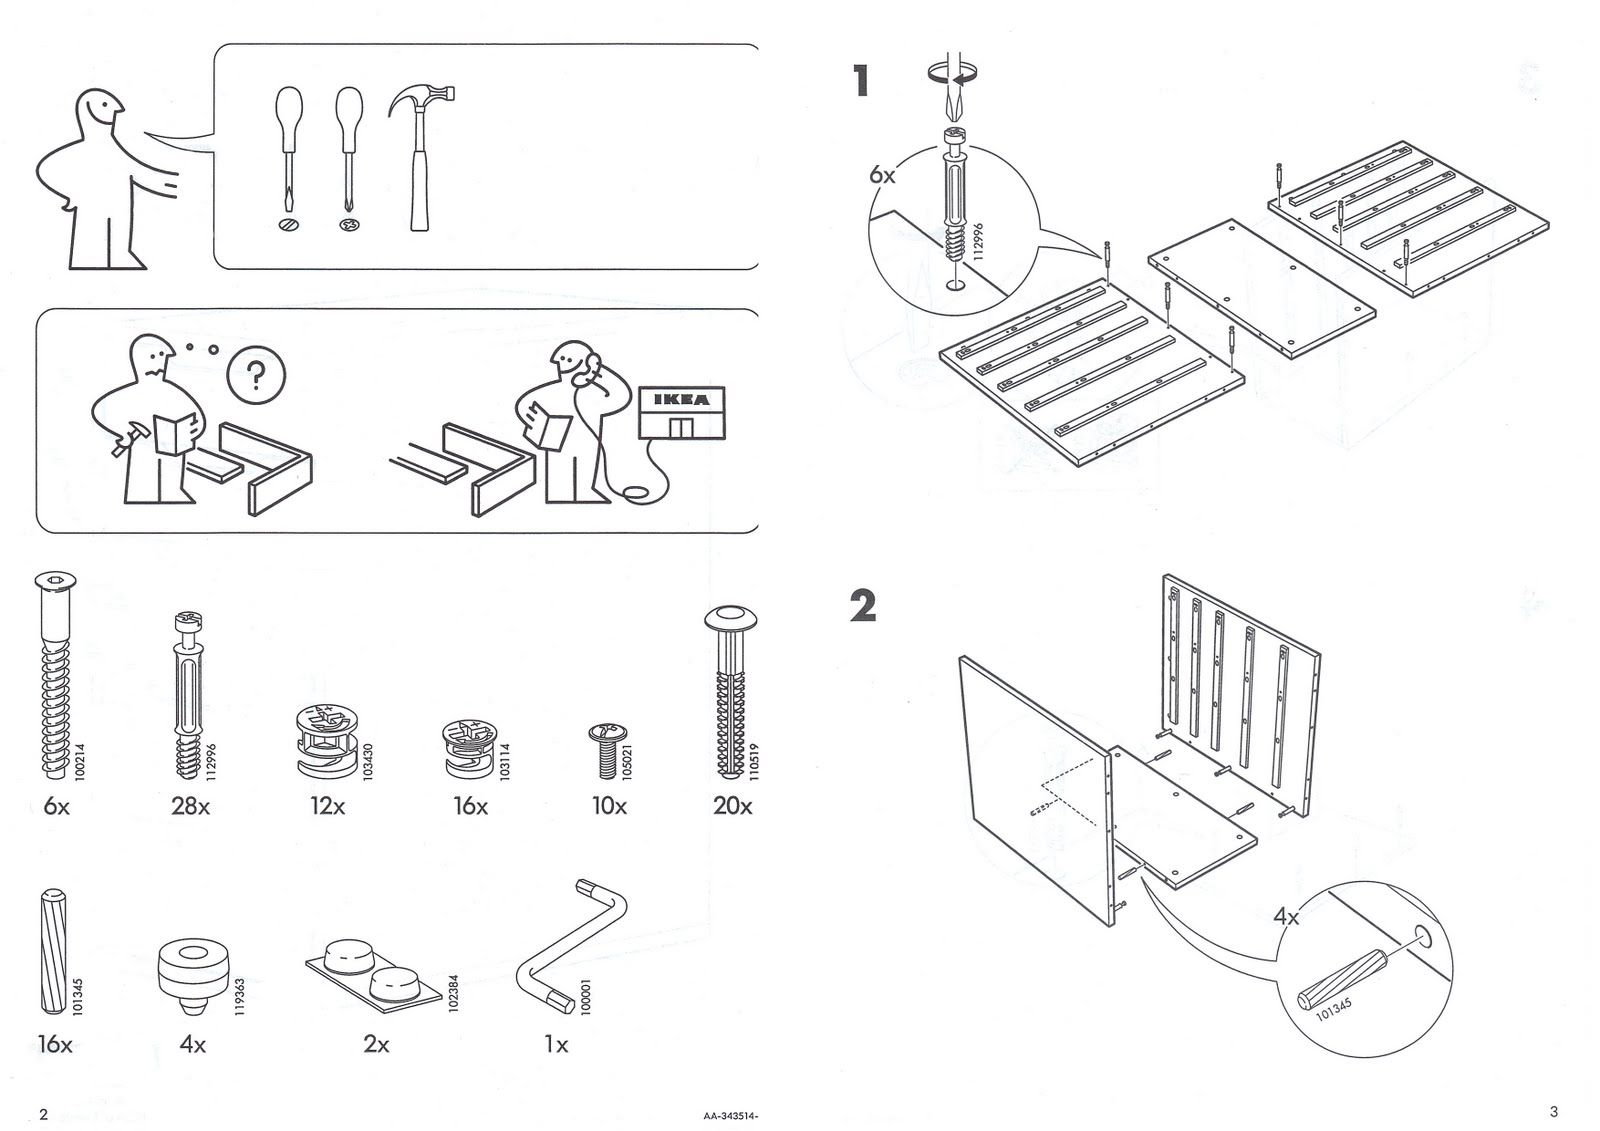 Instruction Manual Design